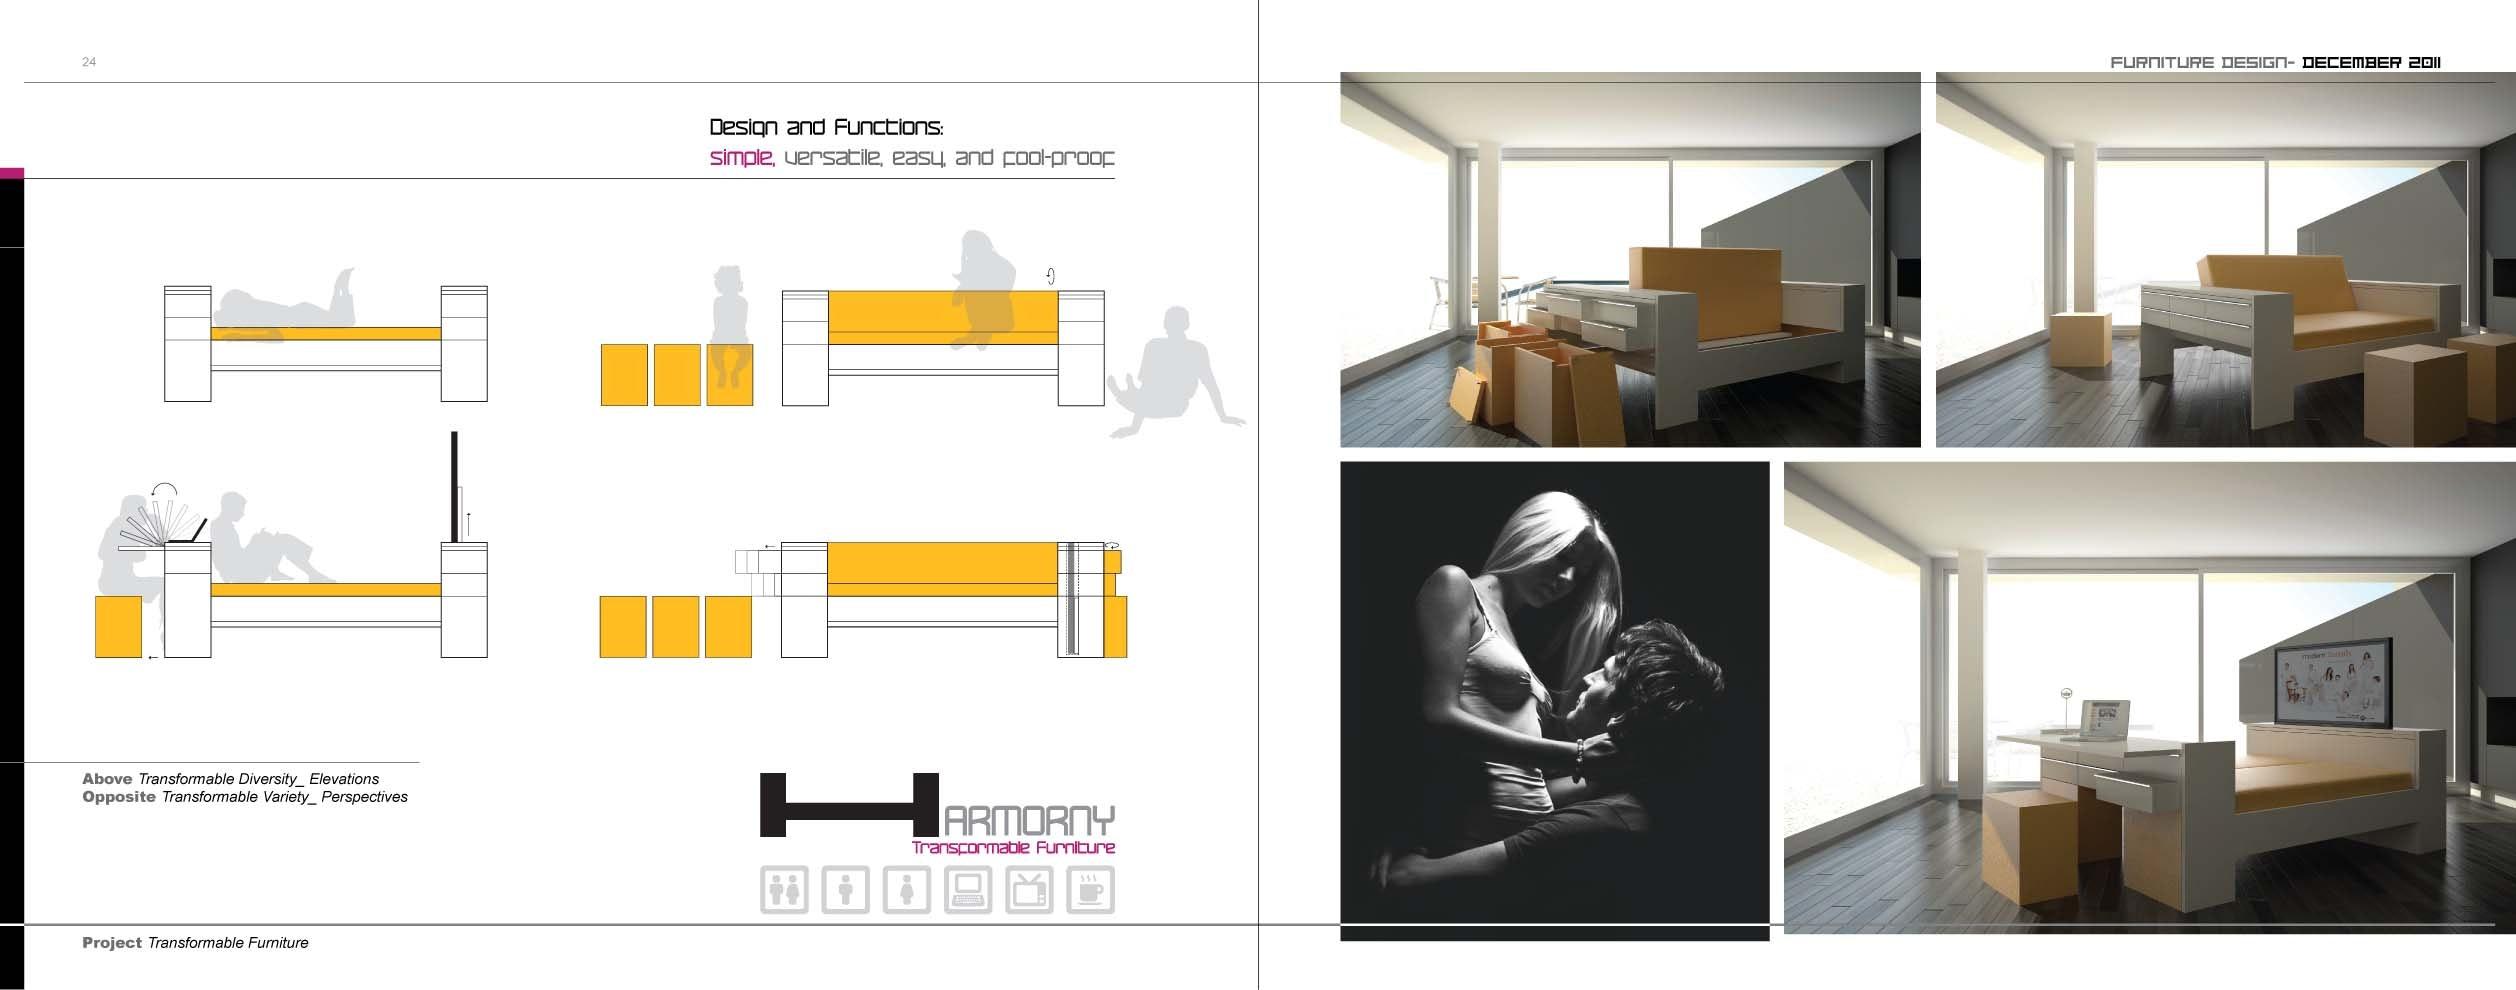 Main Page  Main Perspective U0026 Vertical Section U0026 Floor Plan